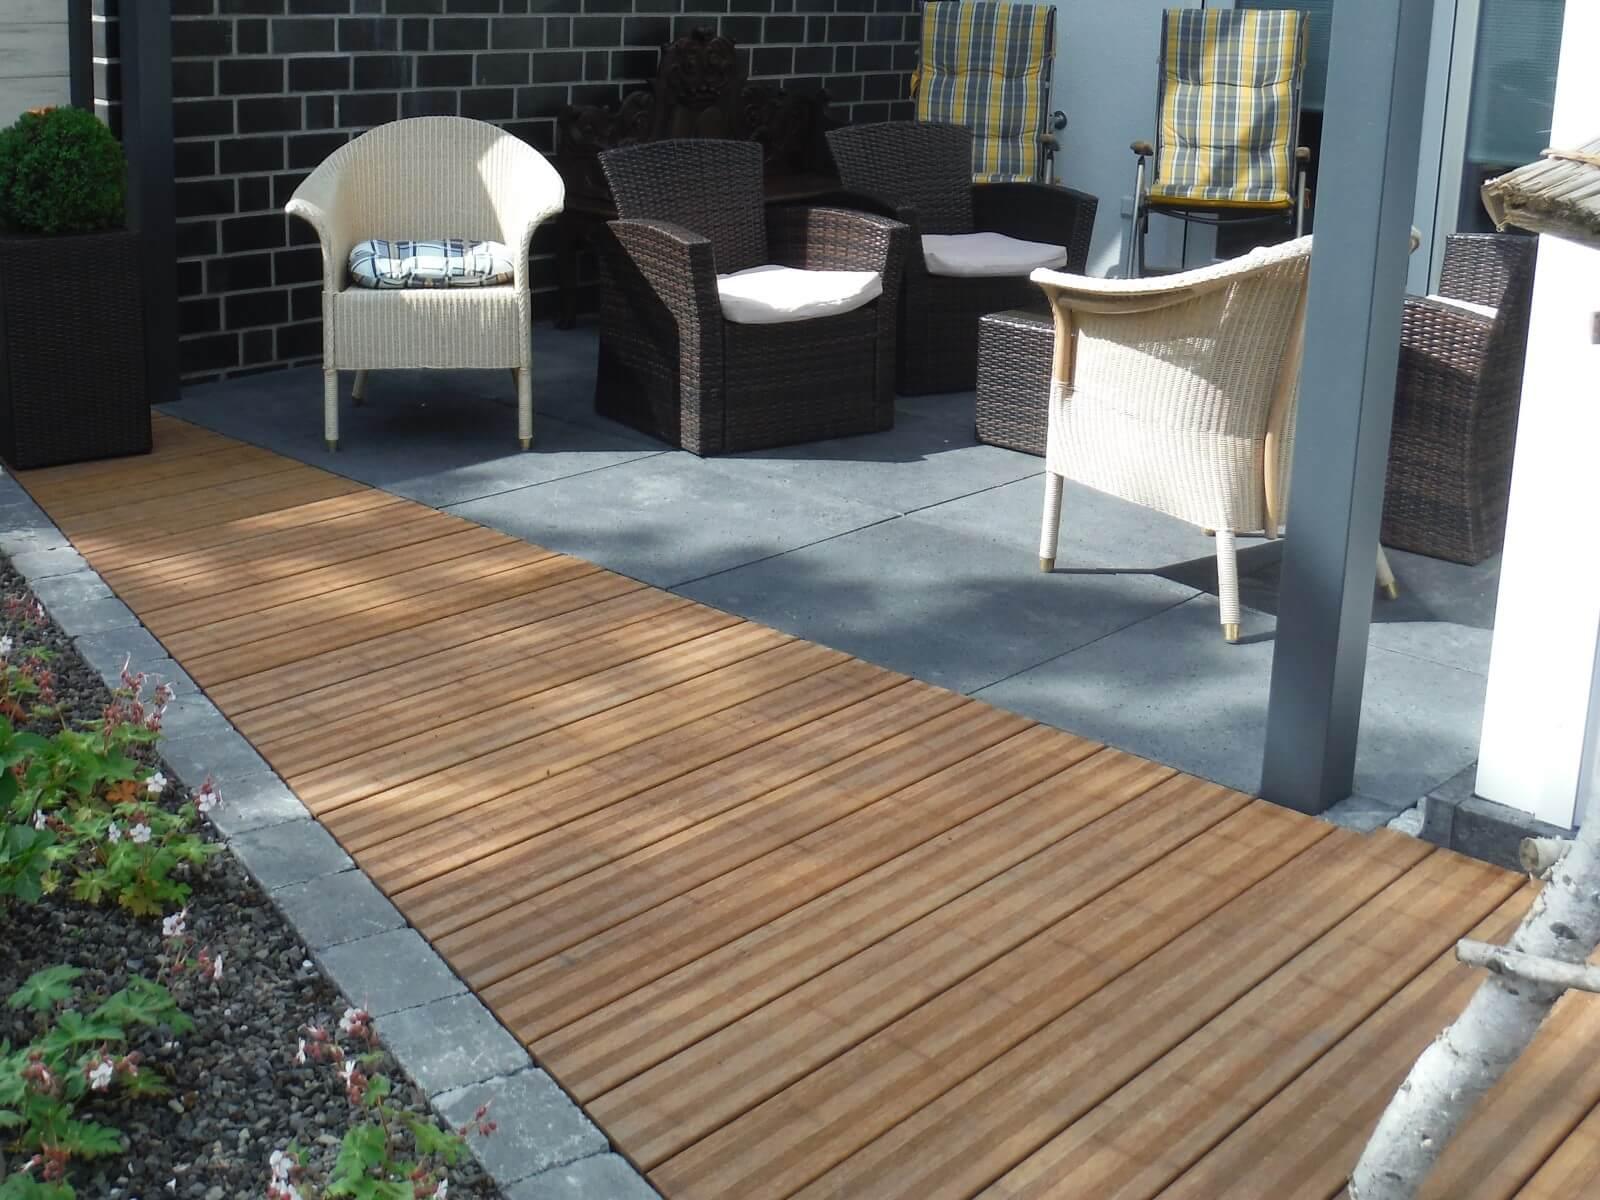 terrasse aus bambus traumgarten. Black Bedroom Furniture Sets. Home Design Ideas